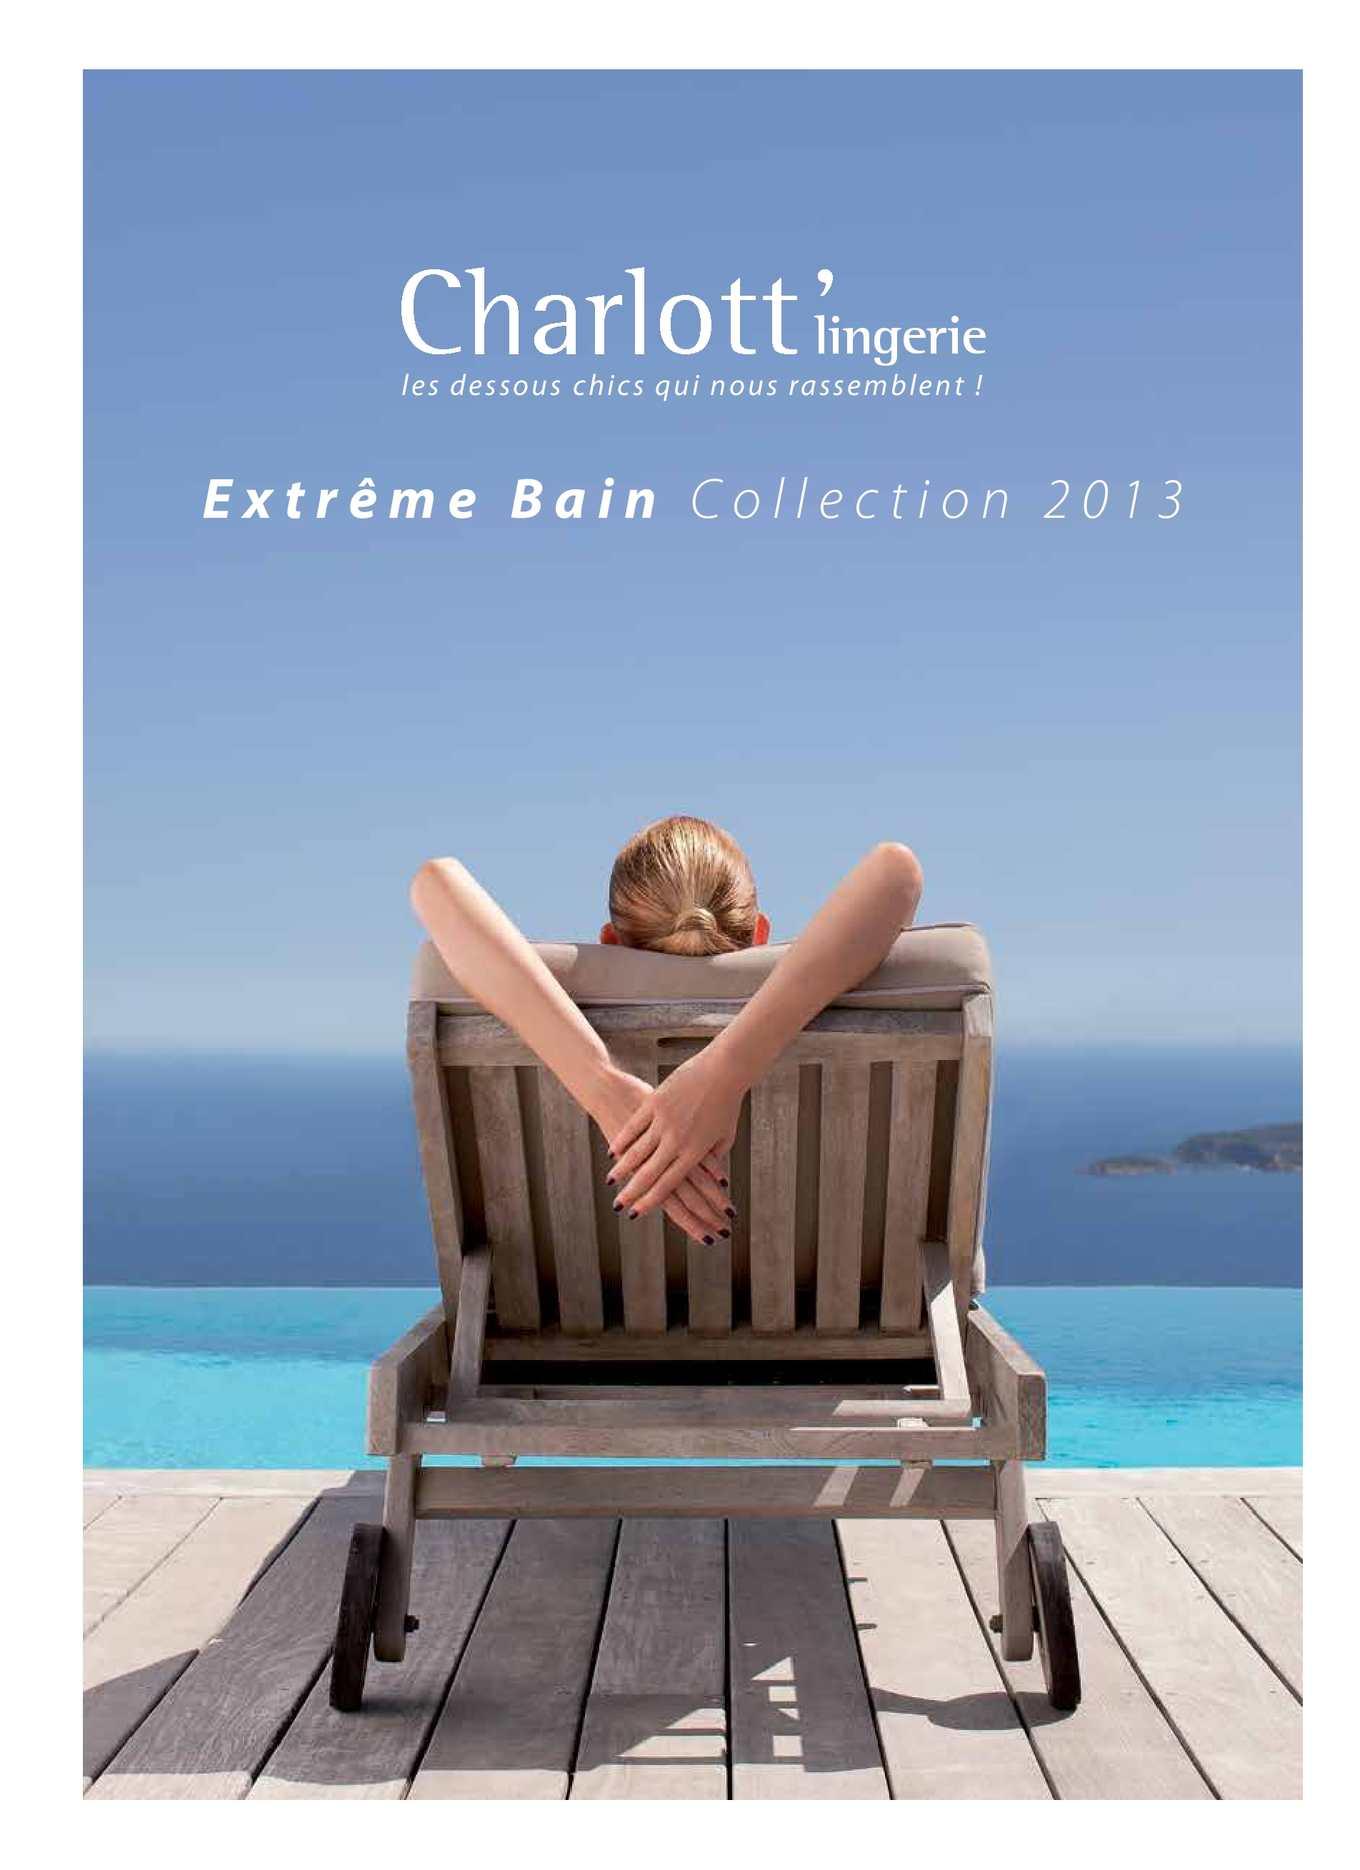 2013-11-28-Cata-Web-extreme-bain(1)